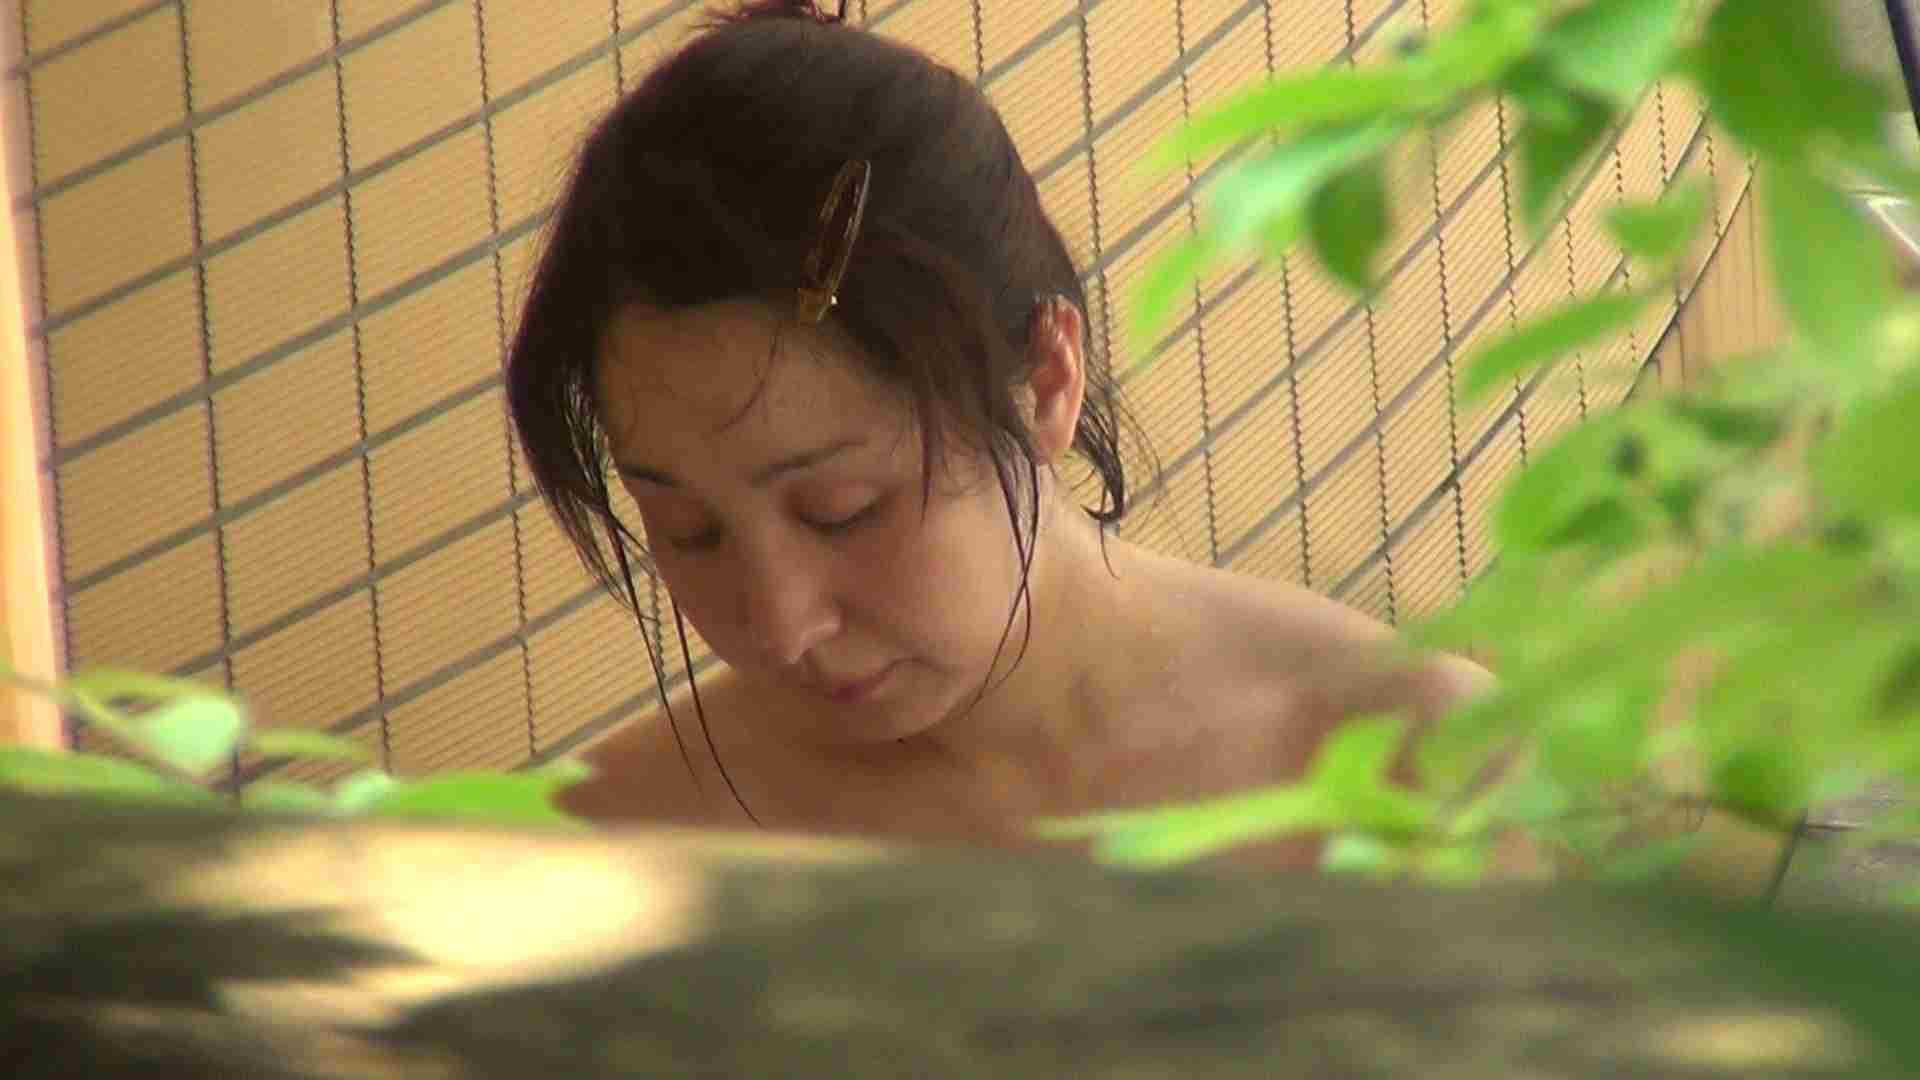 Aquaな露天風呂Vol.308 盗撮映像  75Pix 23